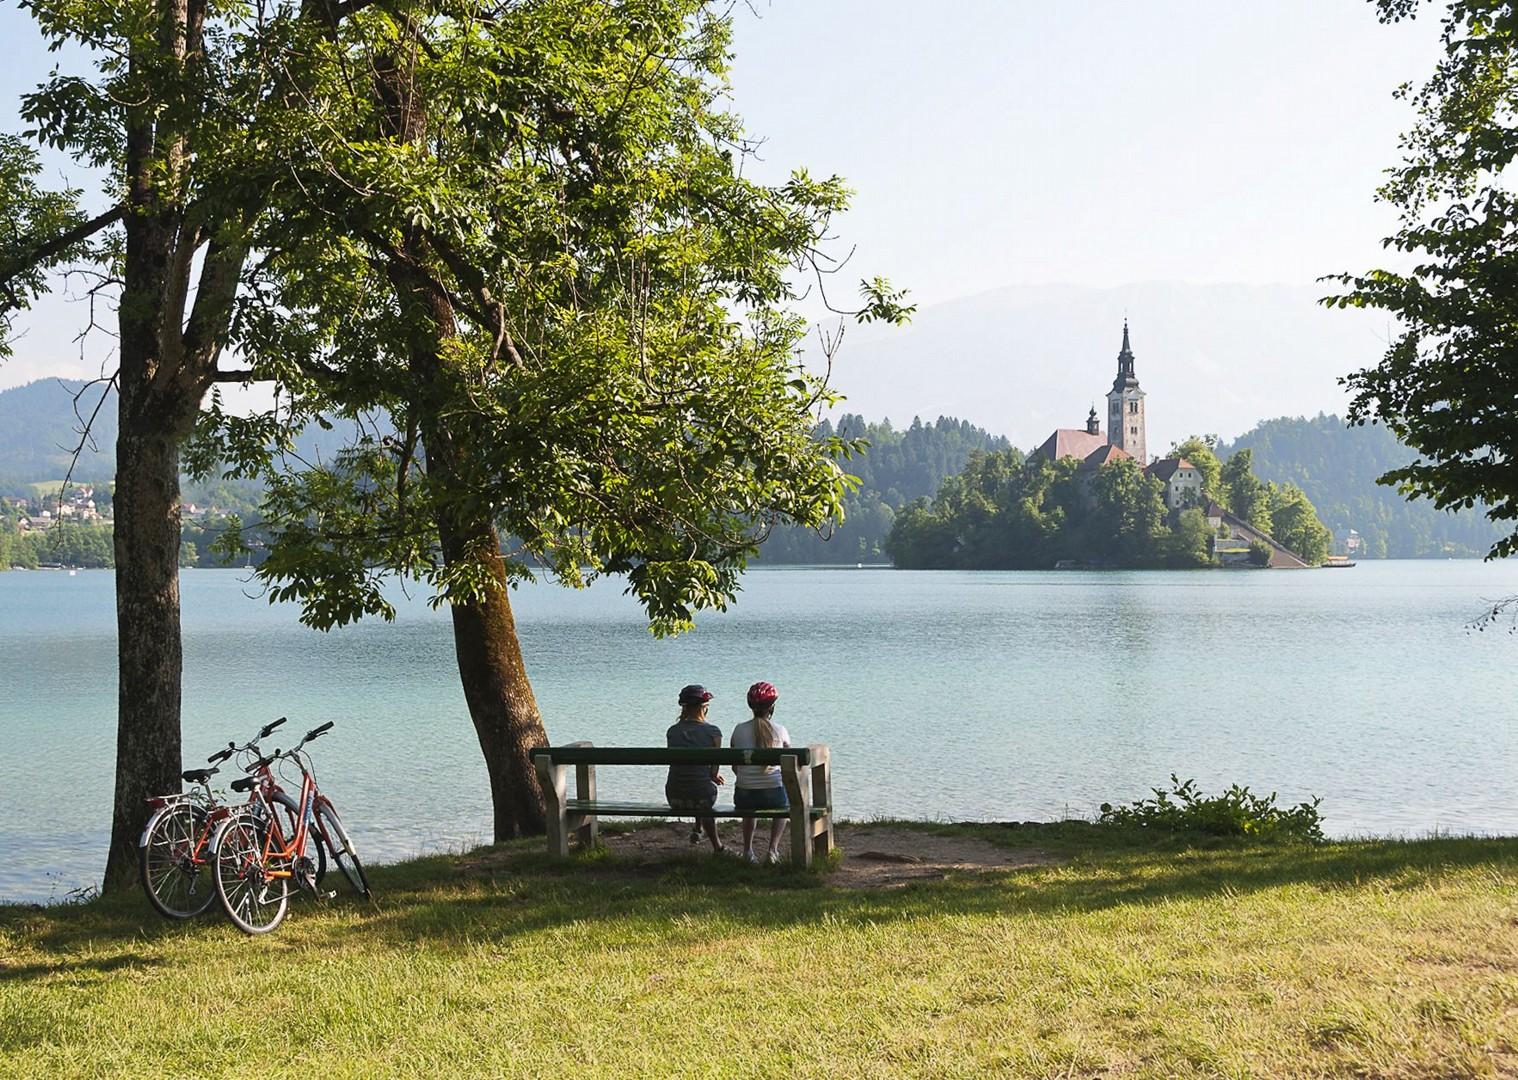 self-guided-leisure-cycling-holiday-slovenia-highlights-of-lake-bled.jpg - Slovenia - Highlights of Lake Bled - Self-Guided Leisure Cycling Holiday - Leisure Cycling